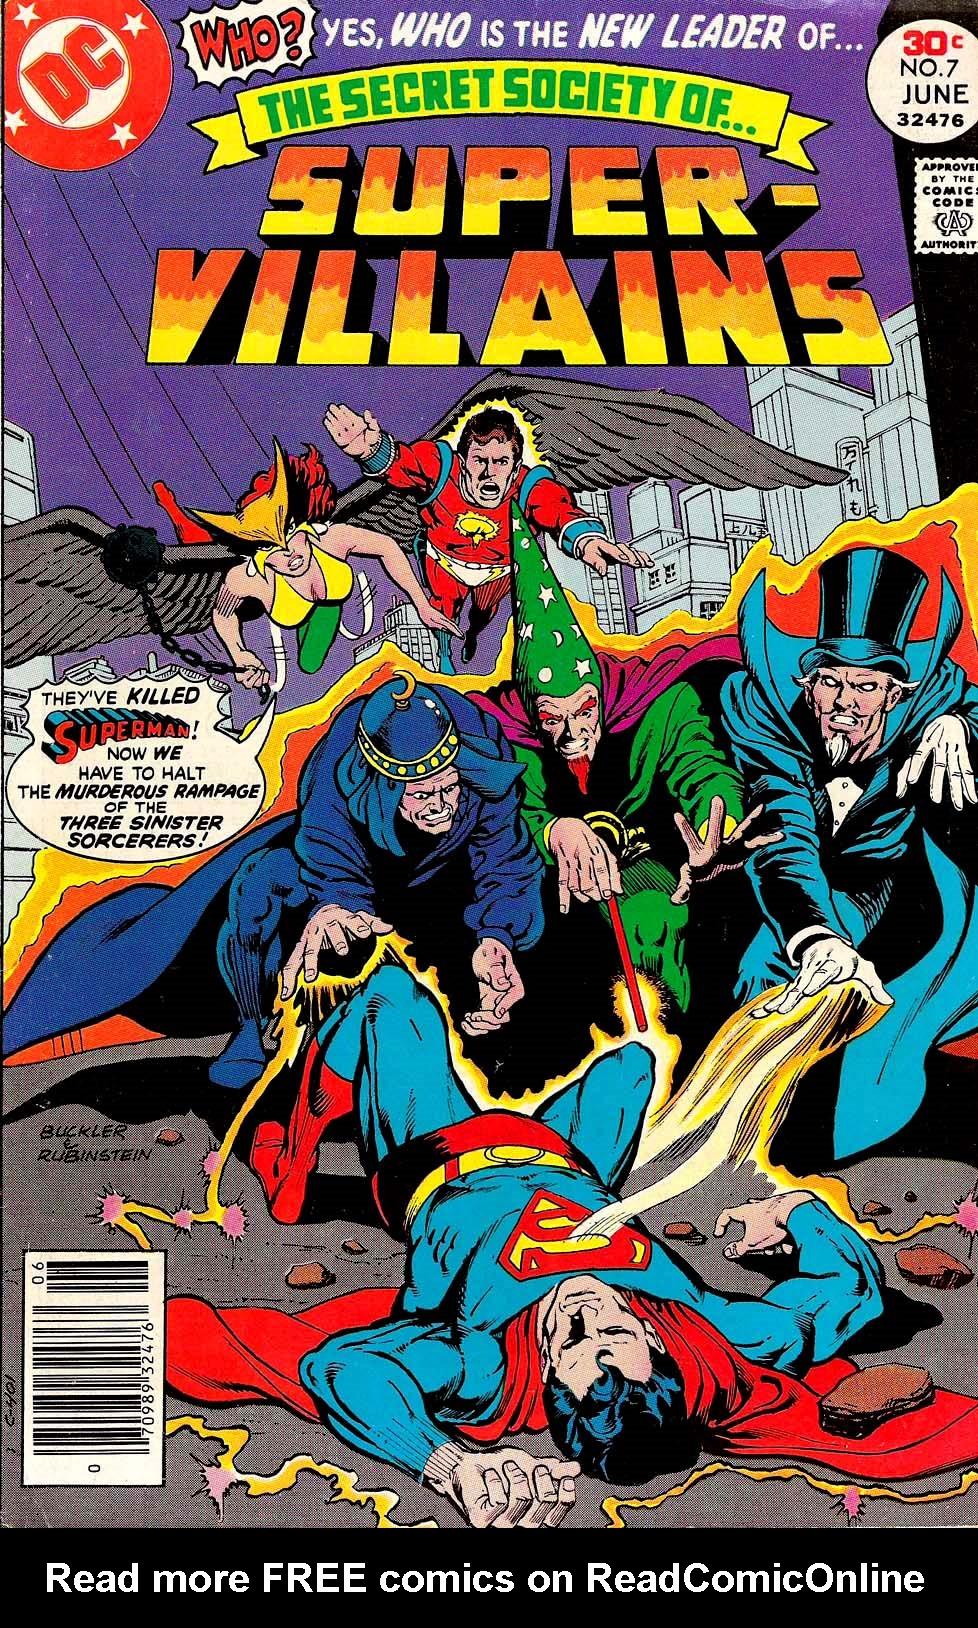 Read online Secret Society of Super-Villains comic -  Issue #7 - 1